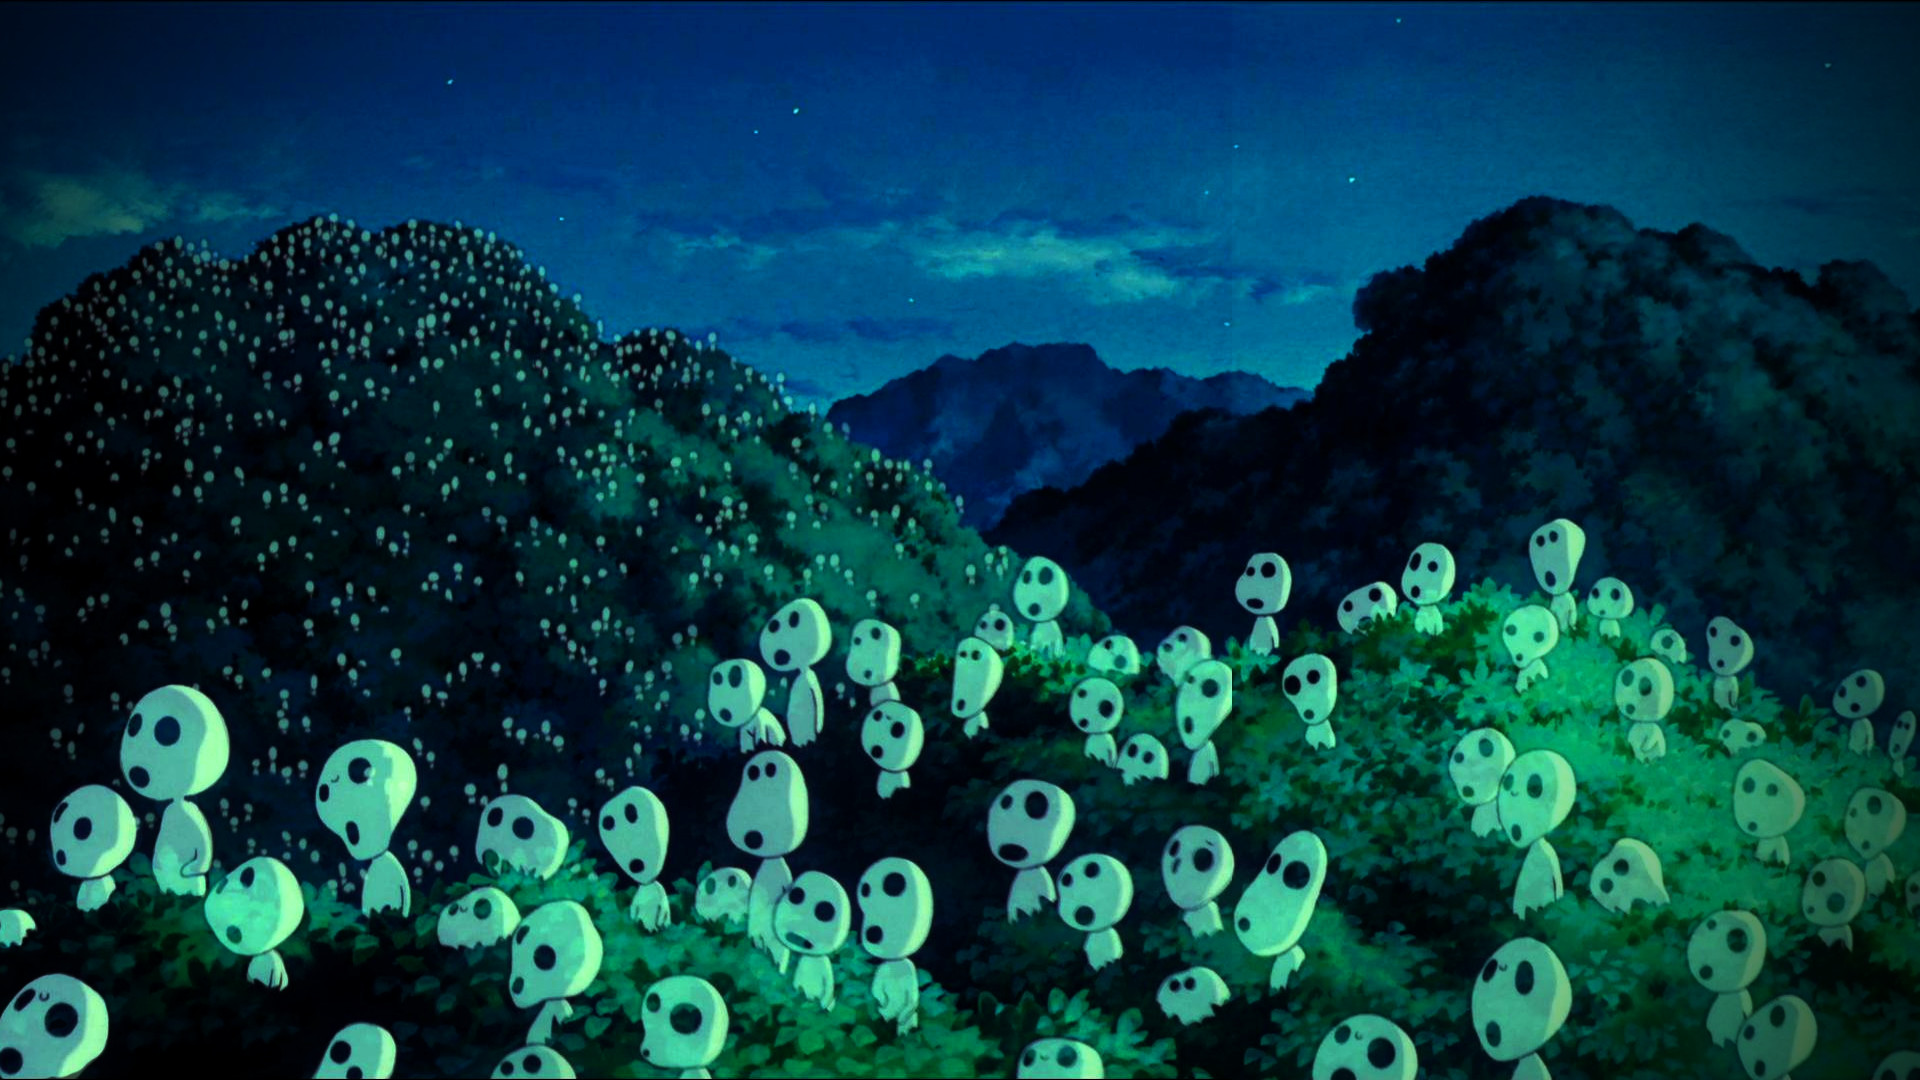 Cute Country Wallpaper Ghibli Background Kodama 51 Images